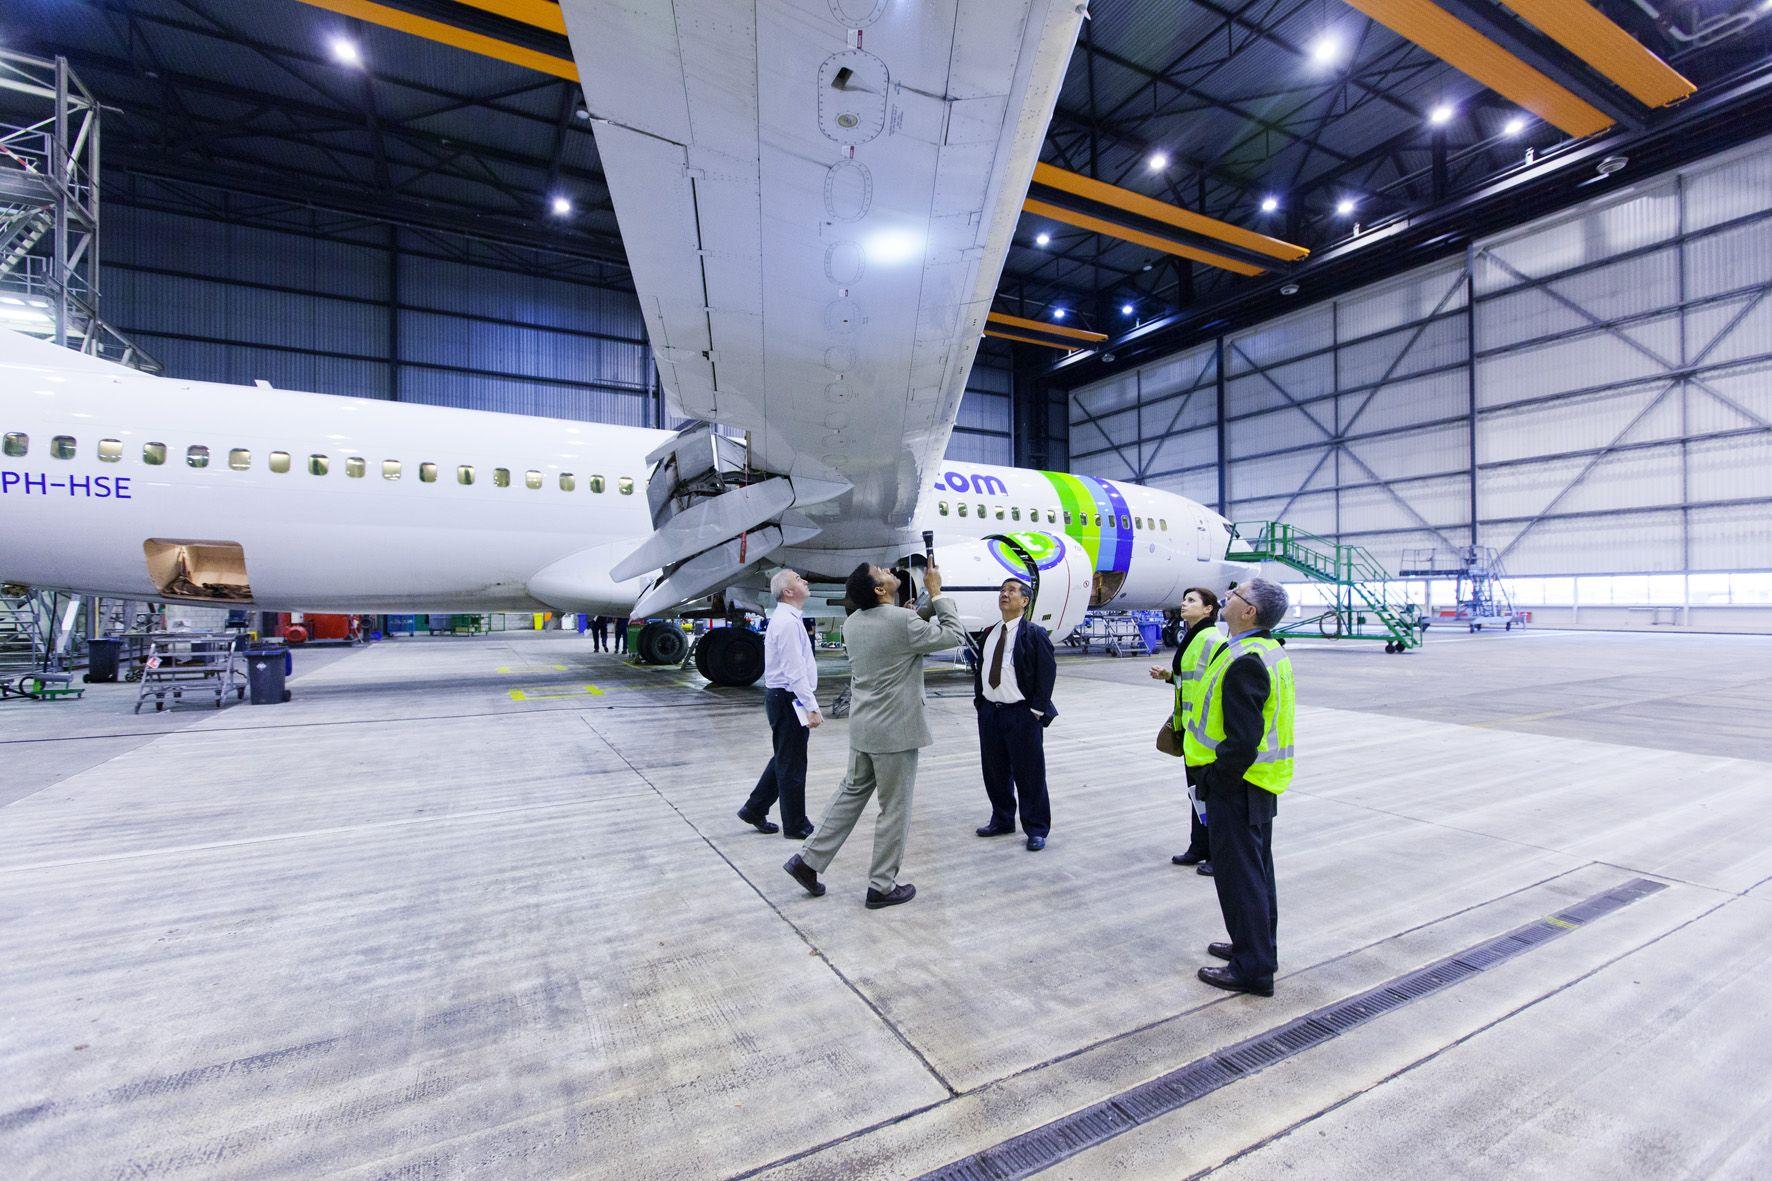 SGI Aviation in hangar. Fotografie verzorgd door Reclamebureau Holland. Regie: Jochem Albrecht